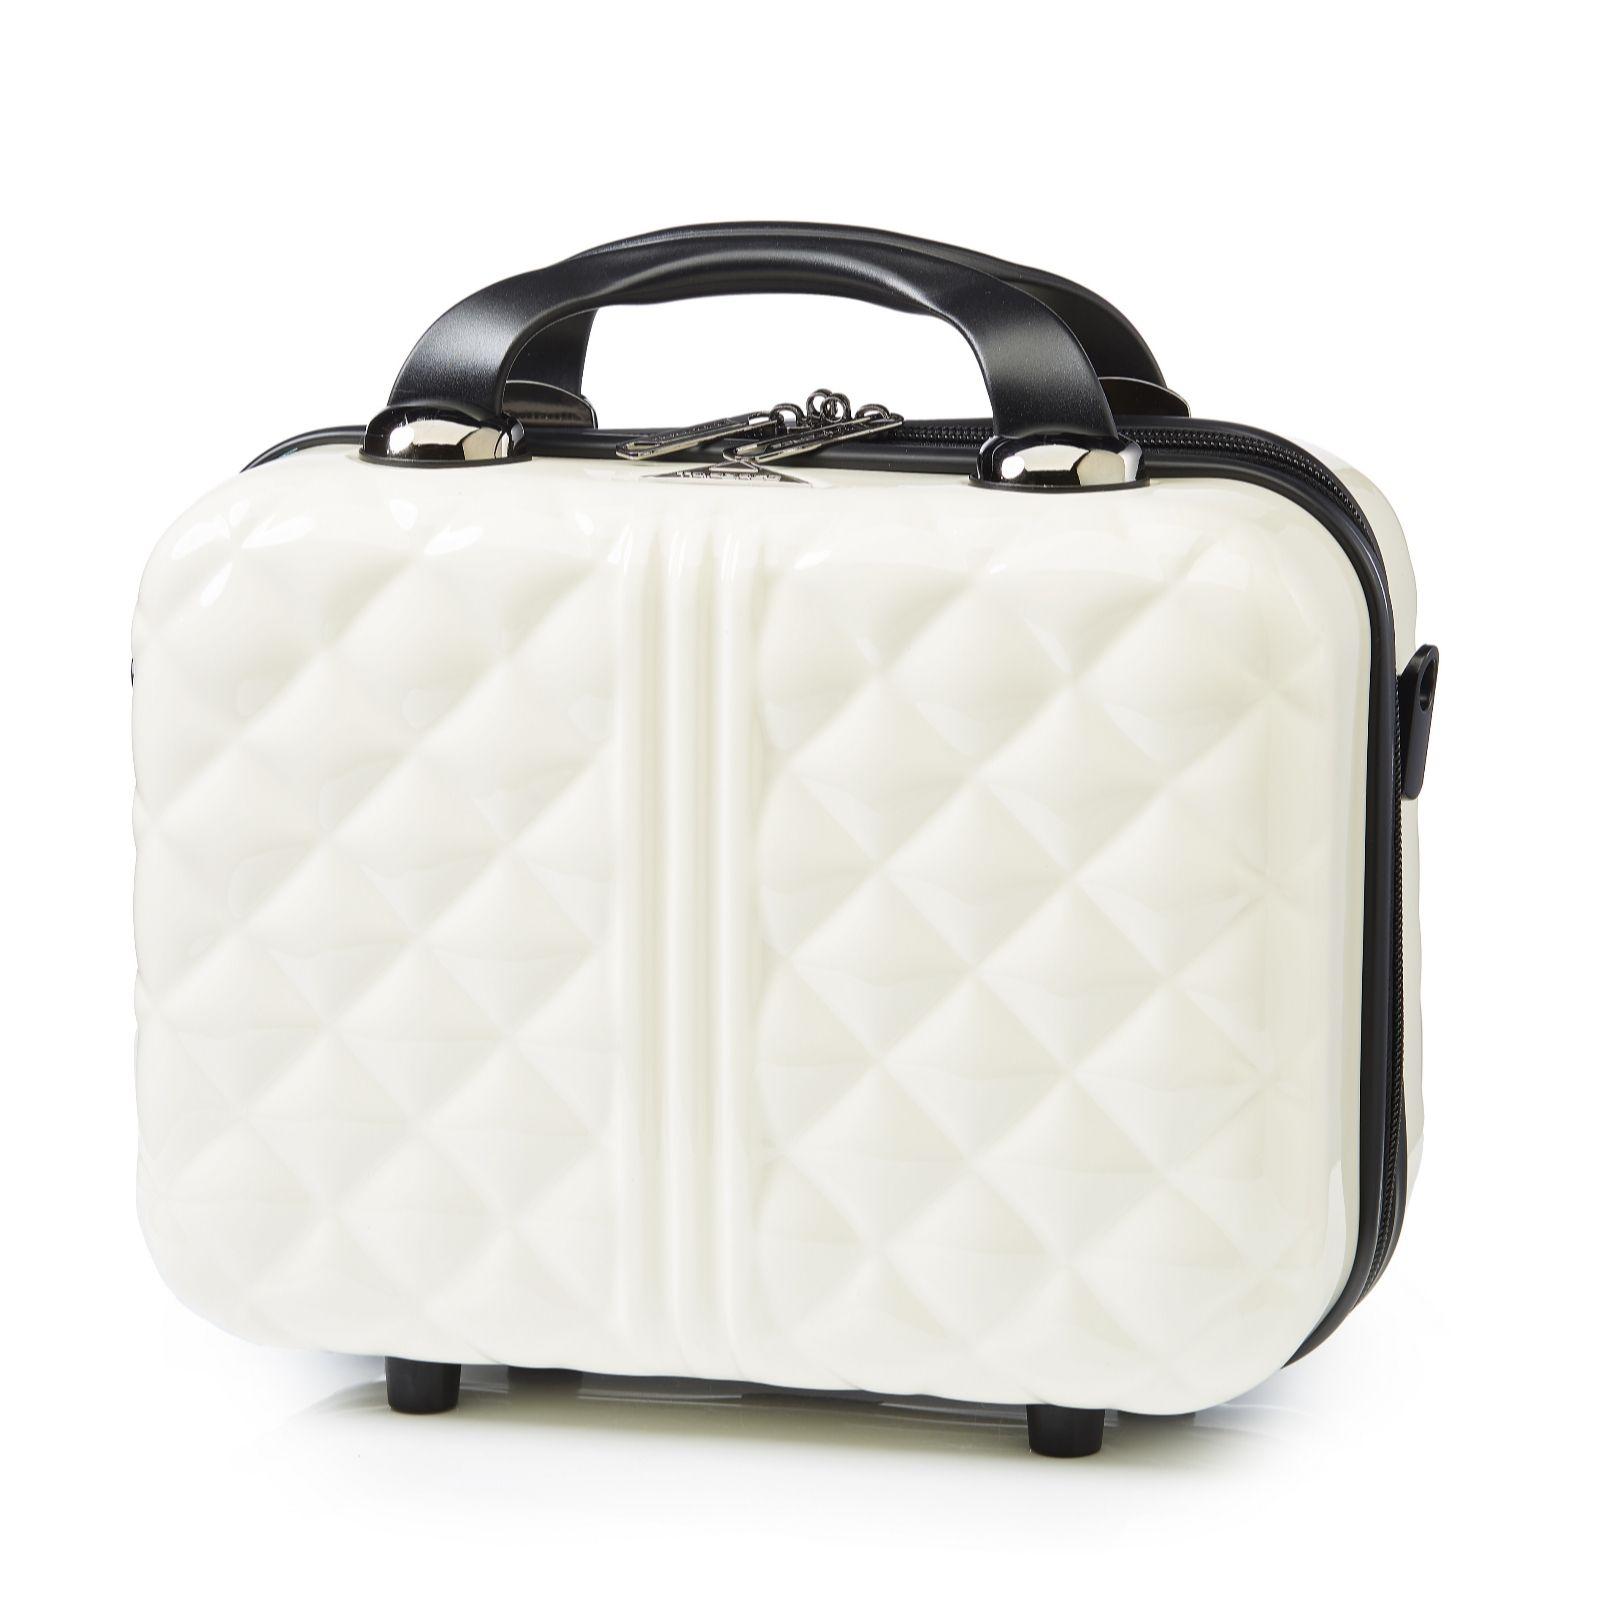 bf521042b69340 Triforce Vanity Case - QVC UK